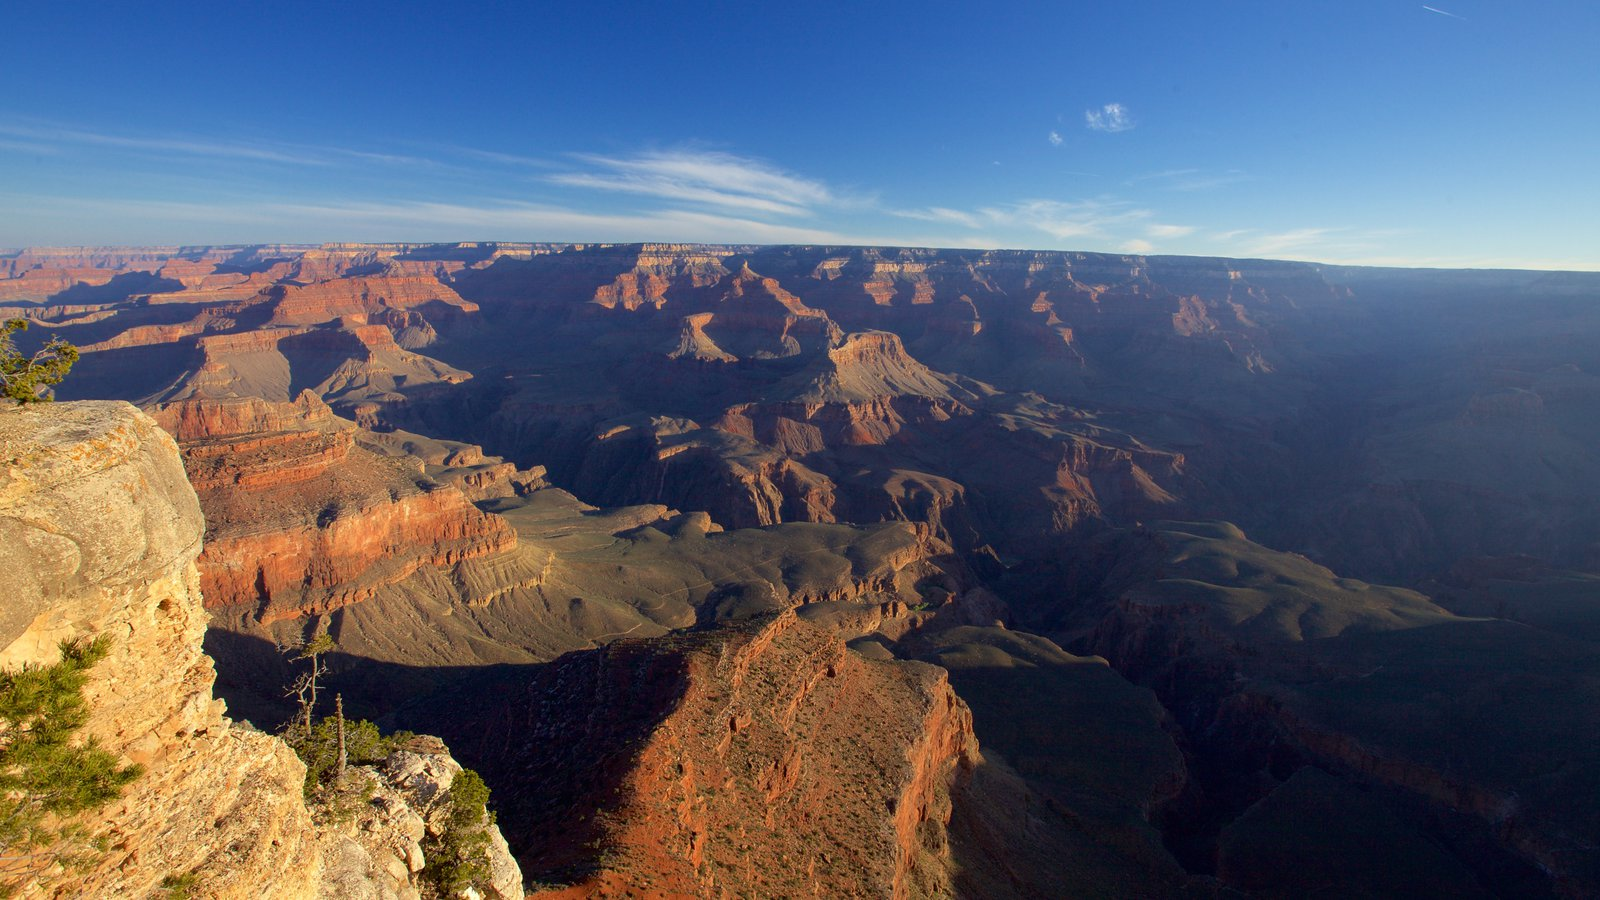 Grand Canyon caracterizando um desfiladeiro ou canyon e paisagem